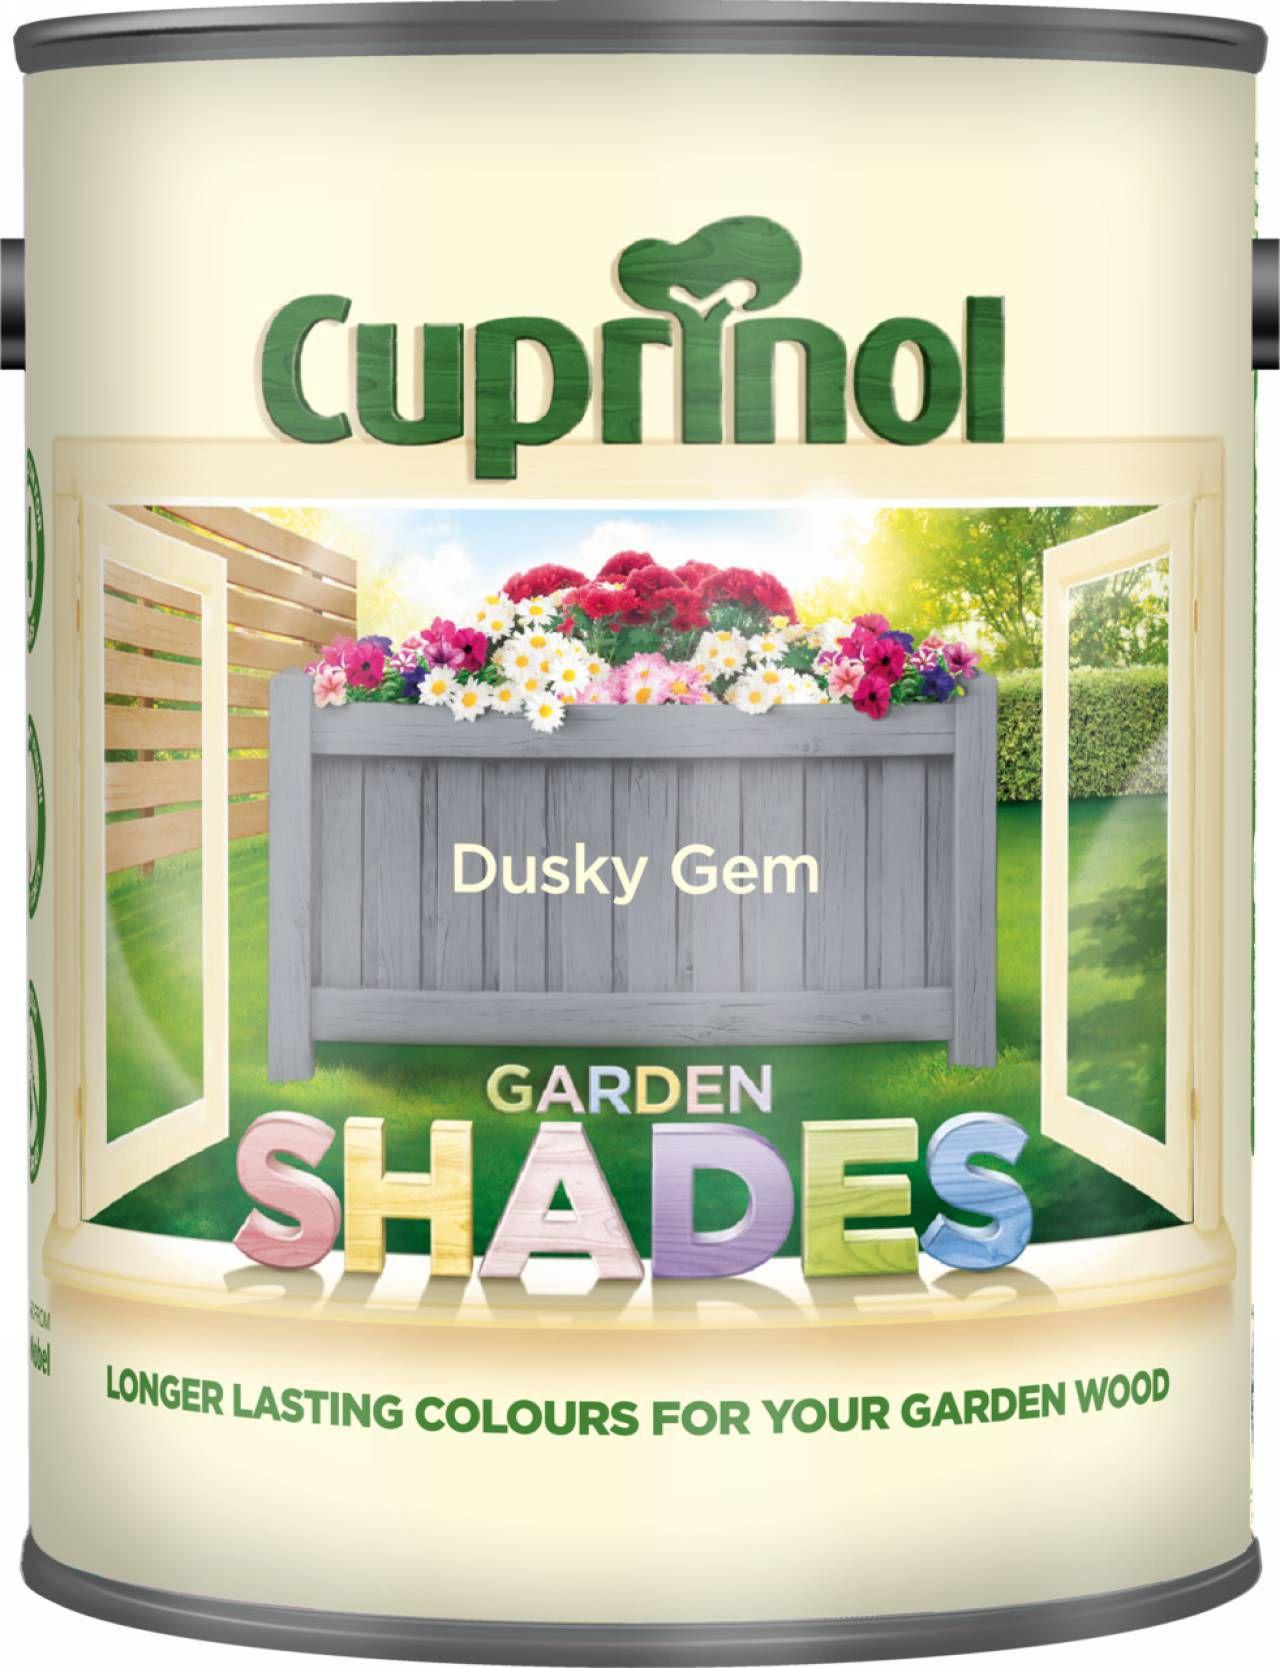 Cuprinol Garden Shades Dusky Gem Matt Wood Paint 1l Departments Diy At B Q